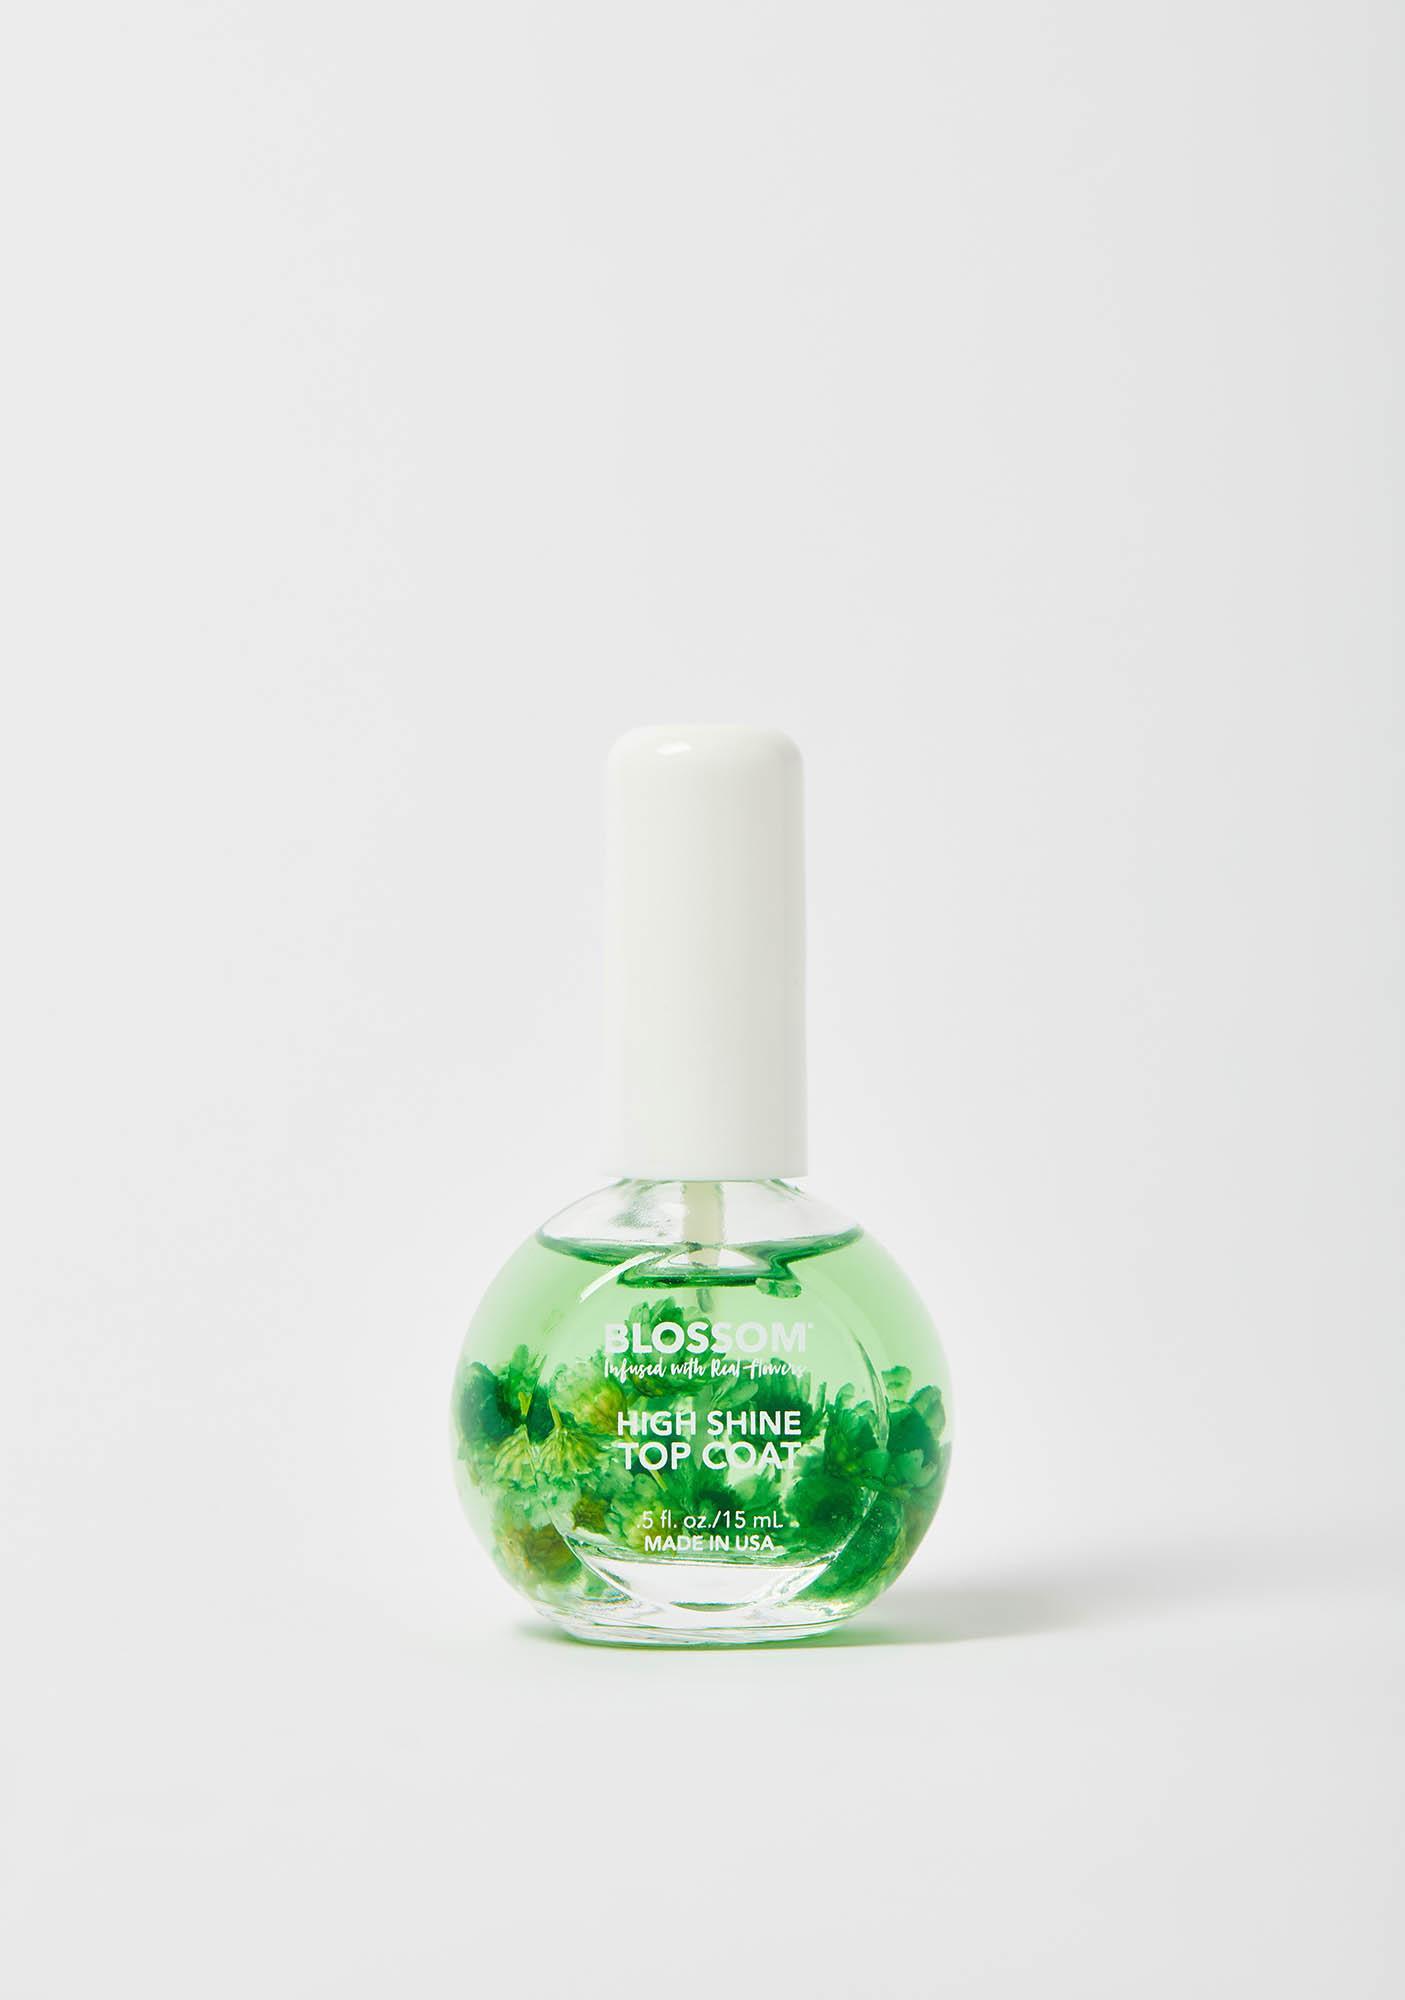 Blossom Green High Shine Top Coat